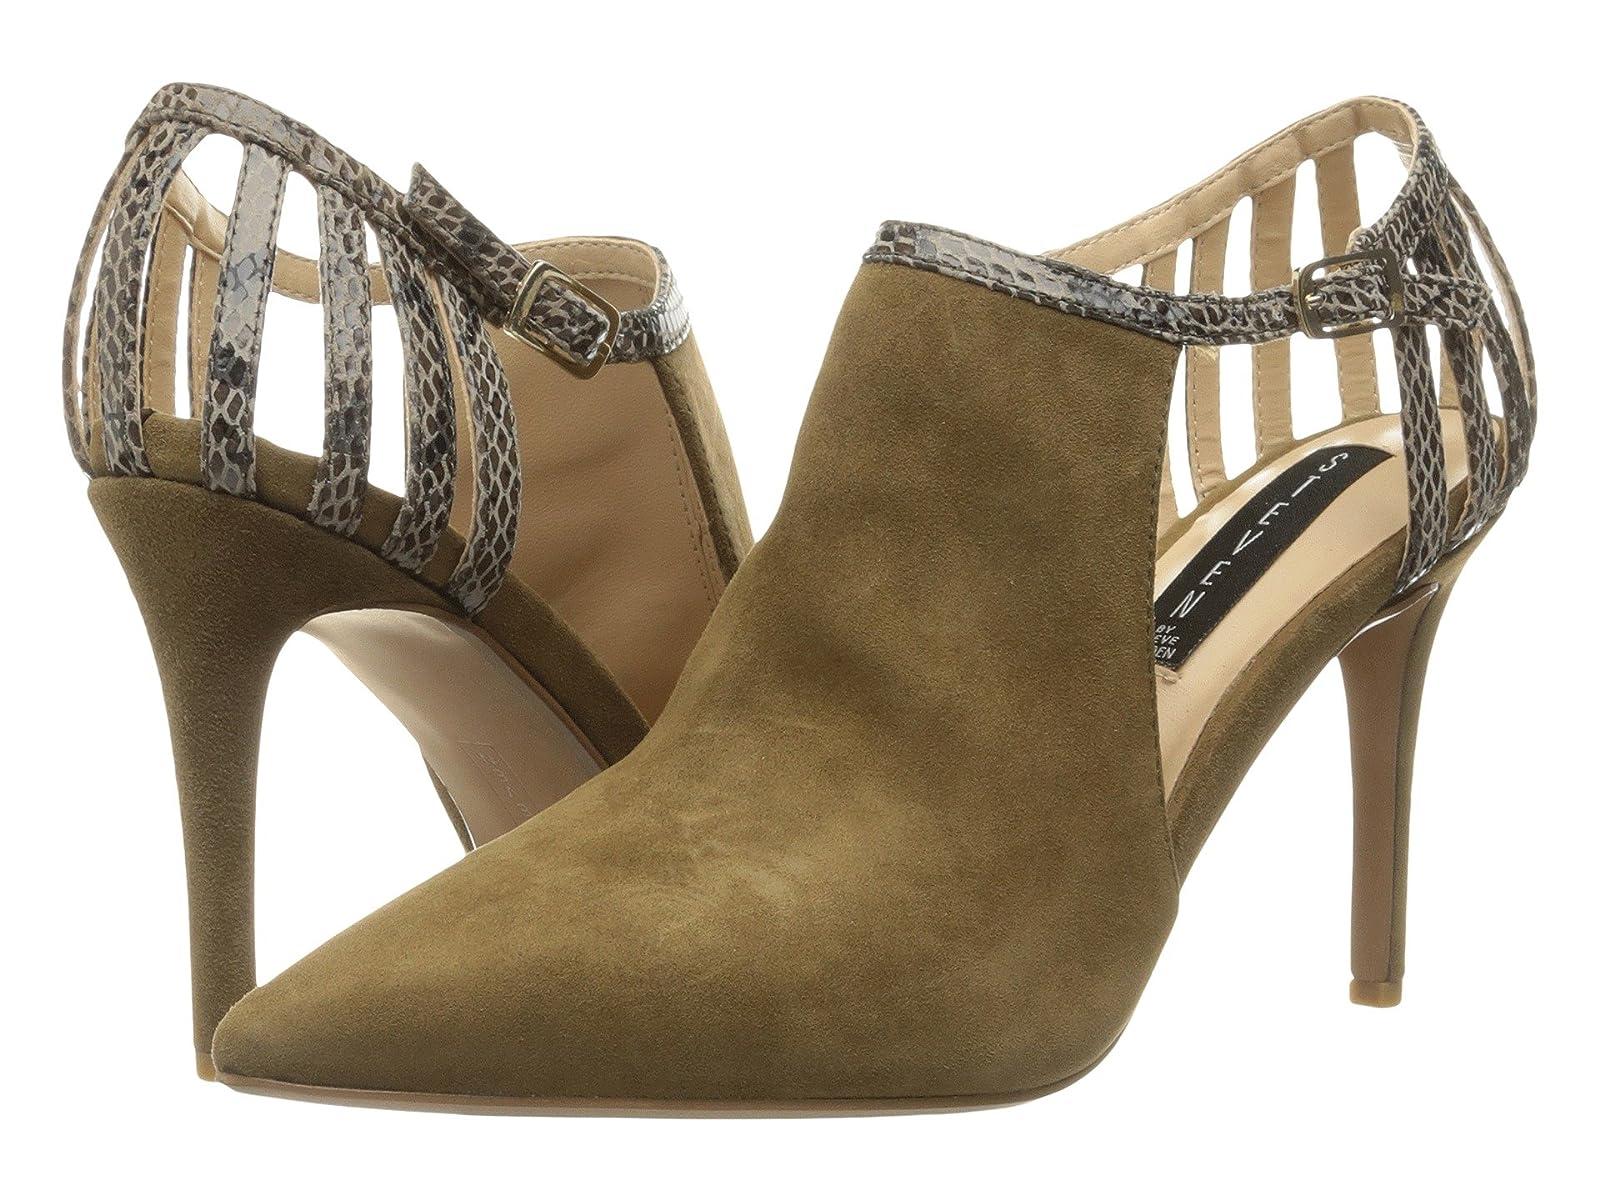 Steven AmyaCheap and distinctive eye-catching shoes